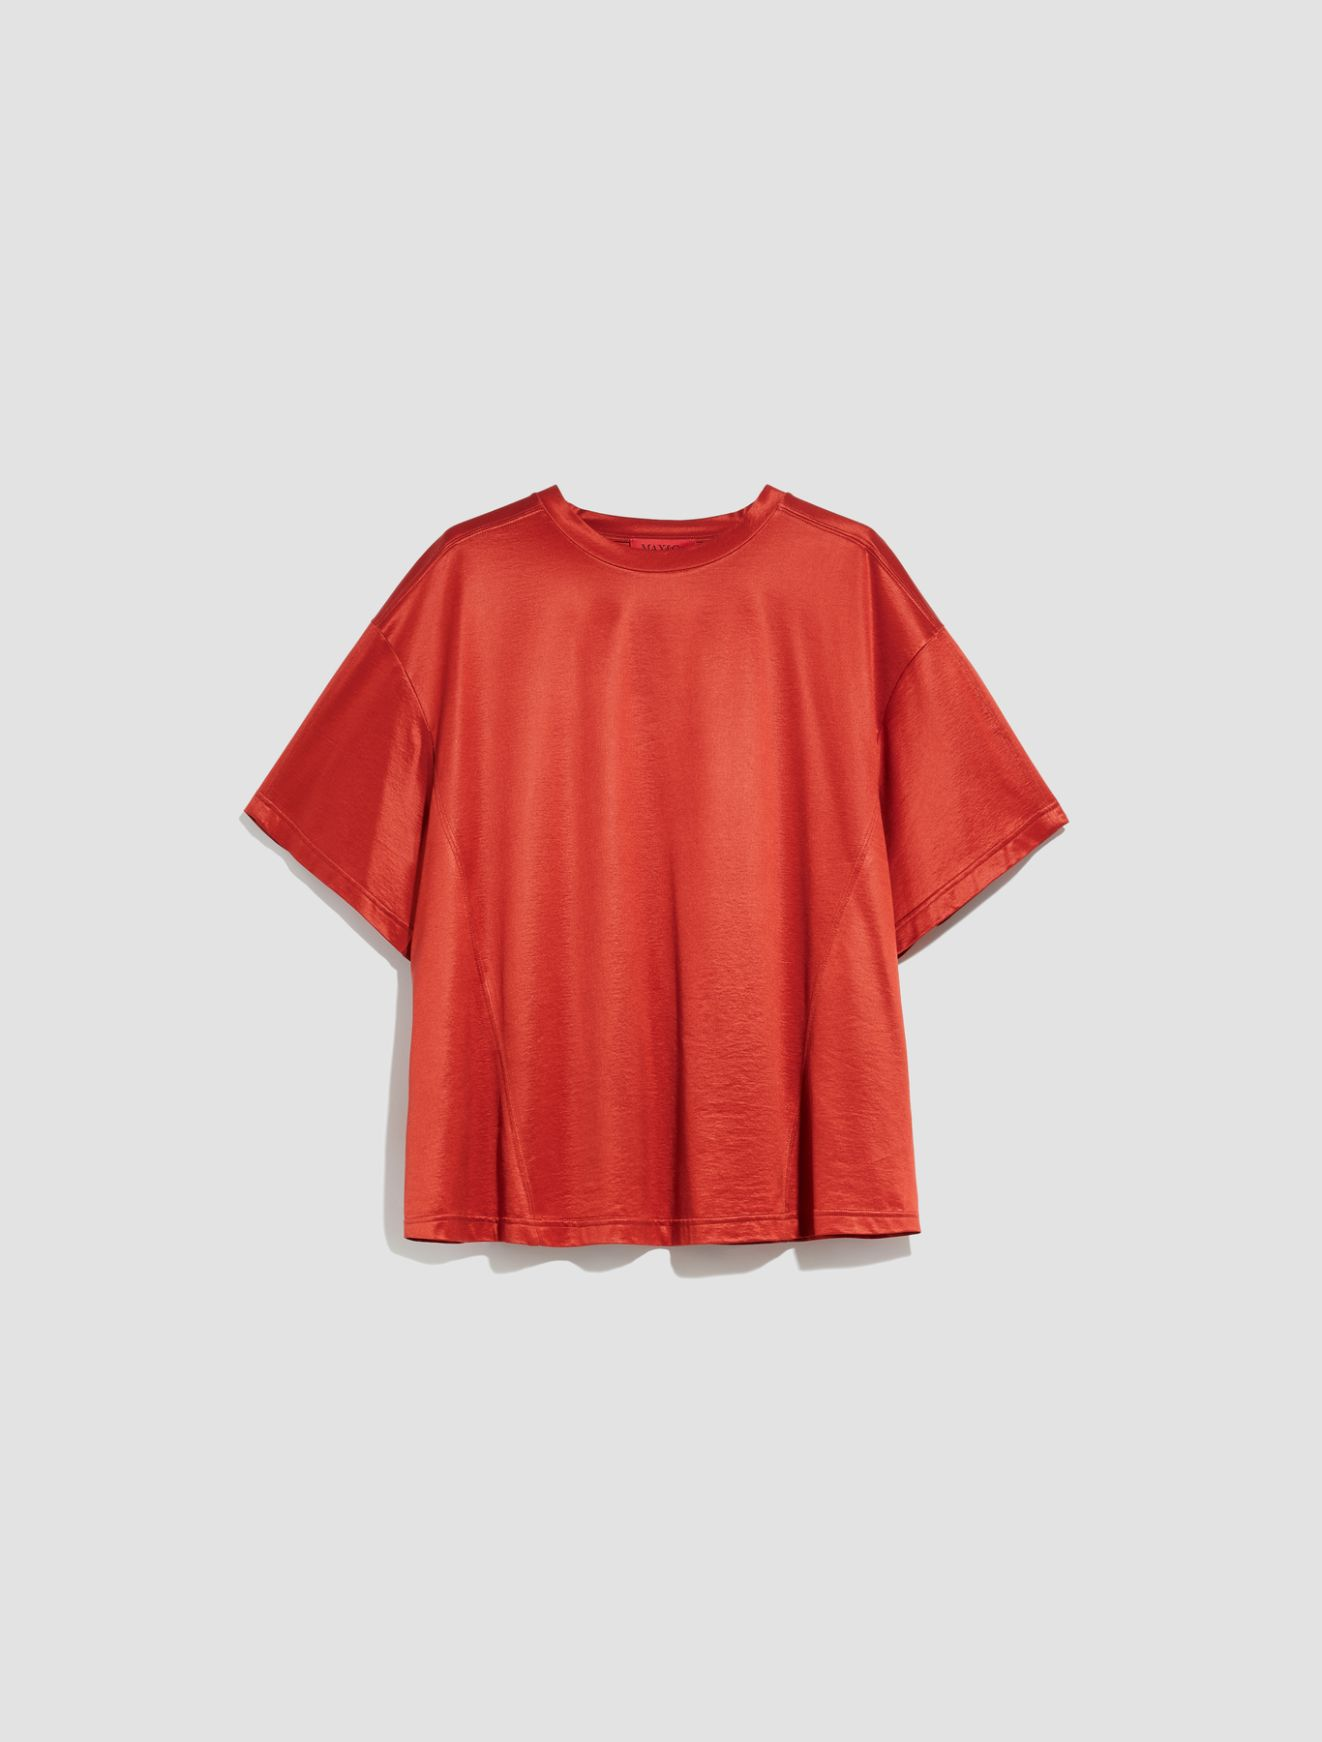 DARIA T-shirt terracotta 5